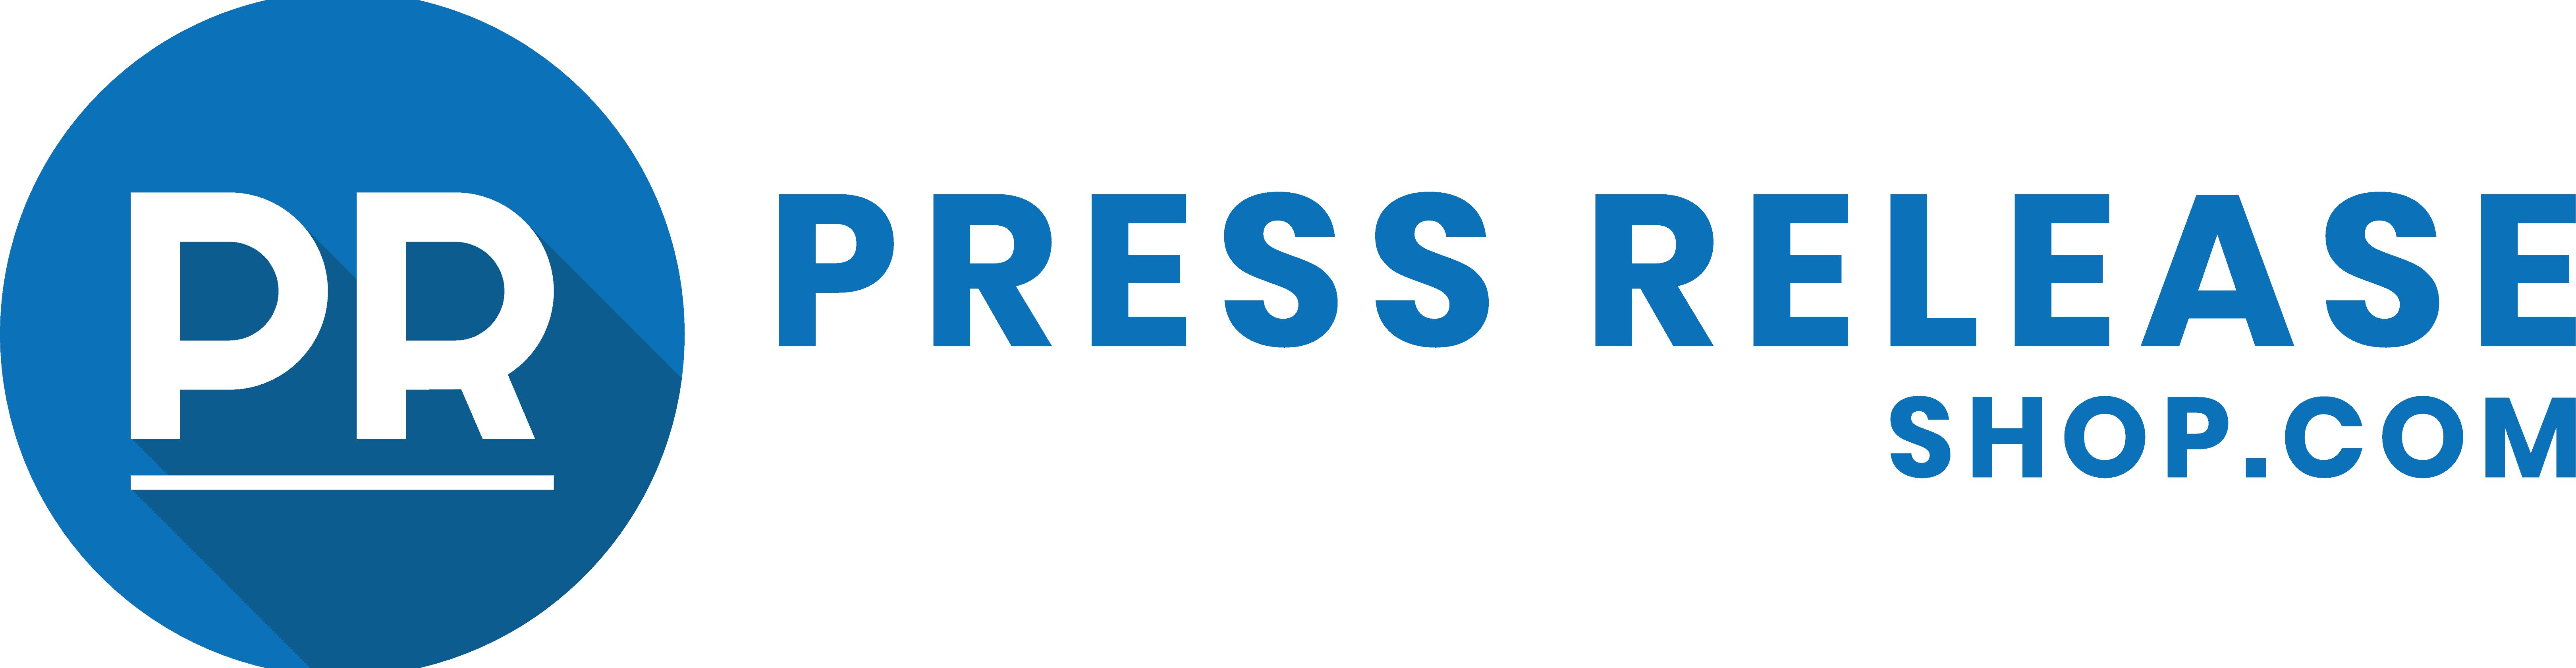 Press Release Shop